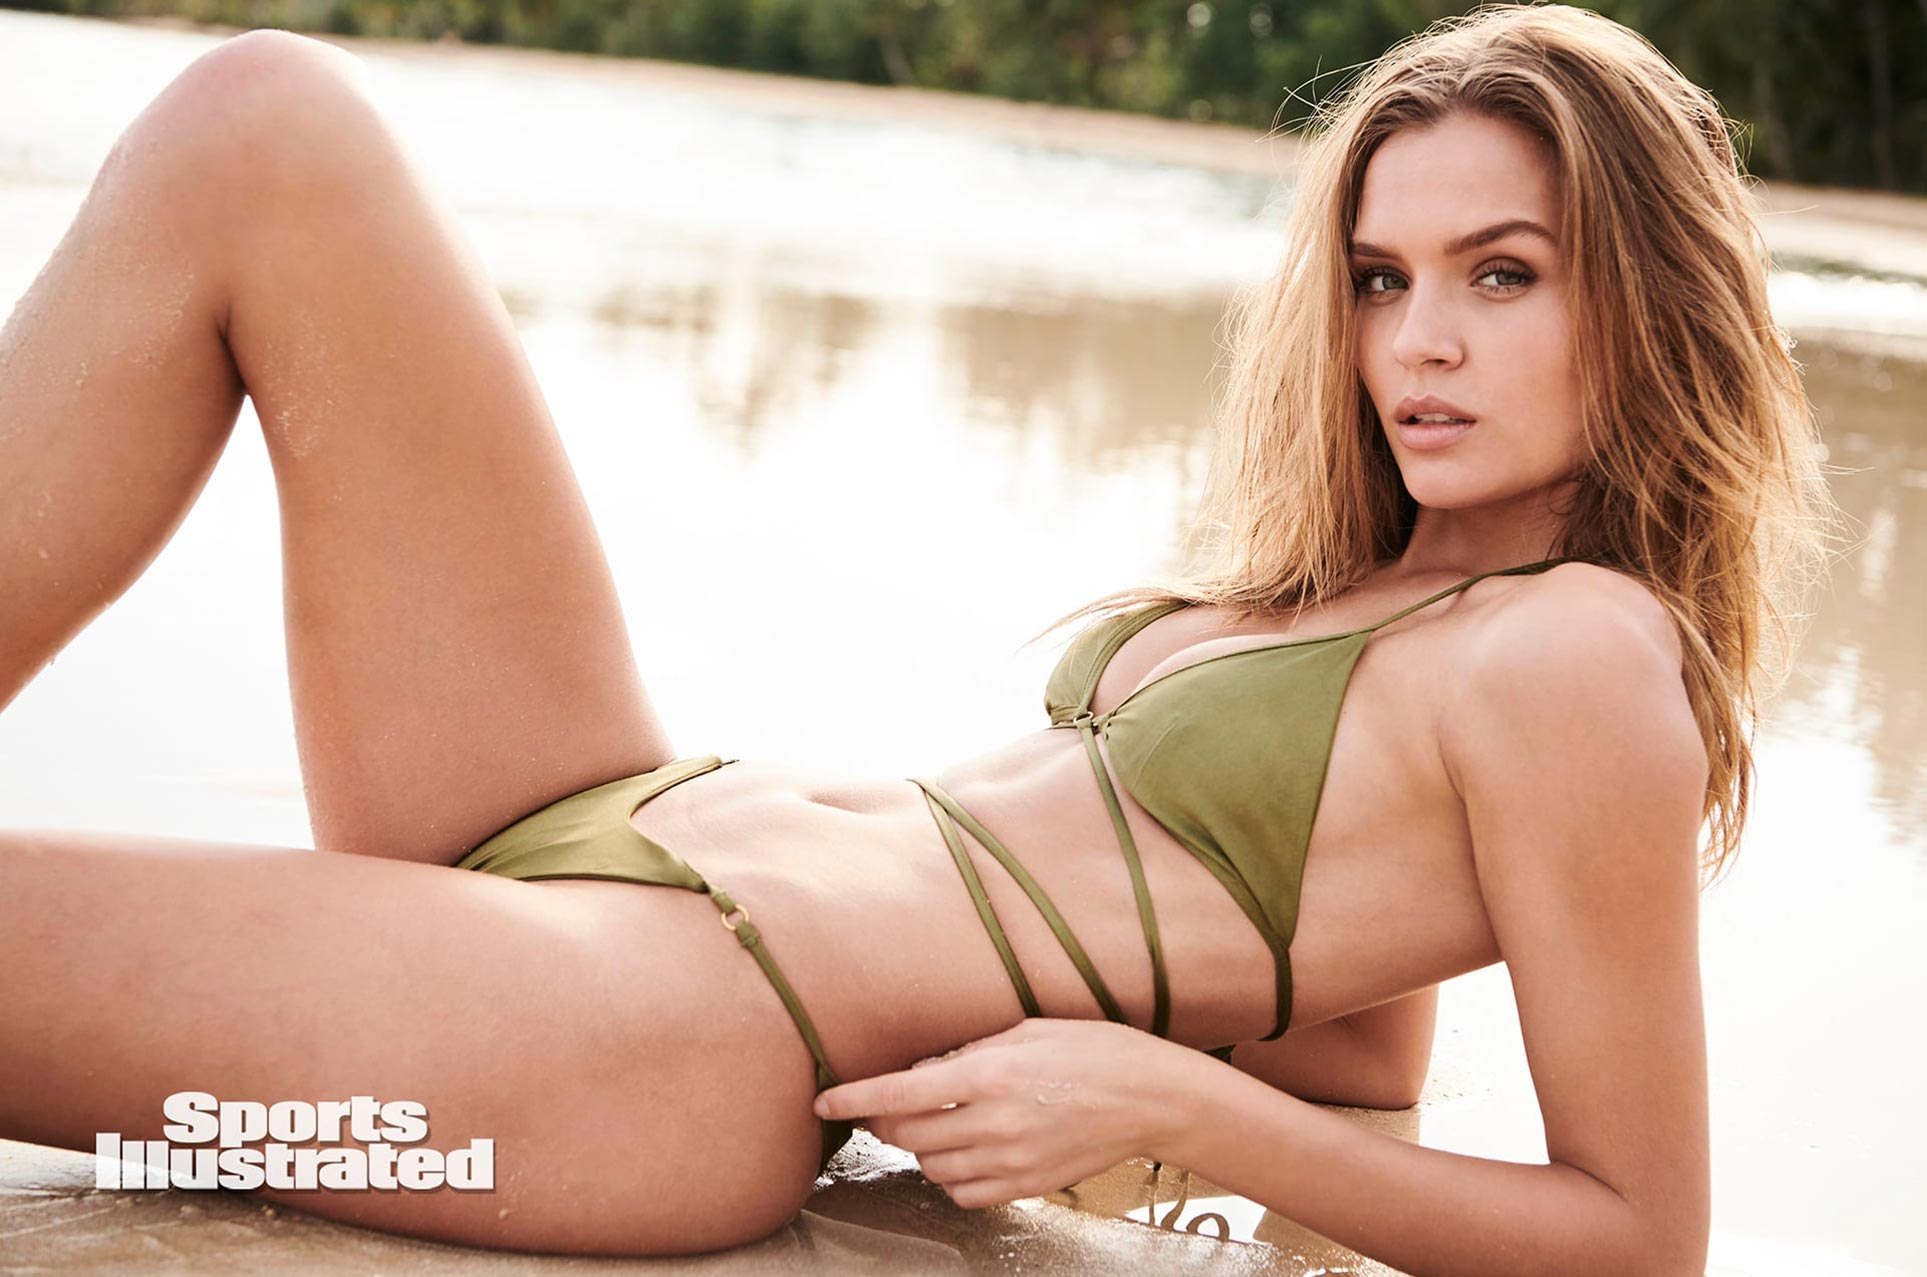 Жозефин Скривер в каталоге купальников Sports Illustrated Swimsuit 2020 / фото 16